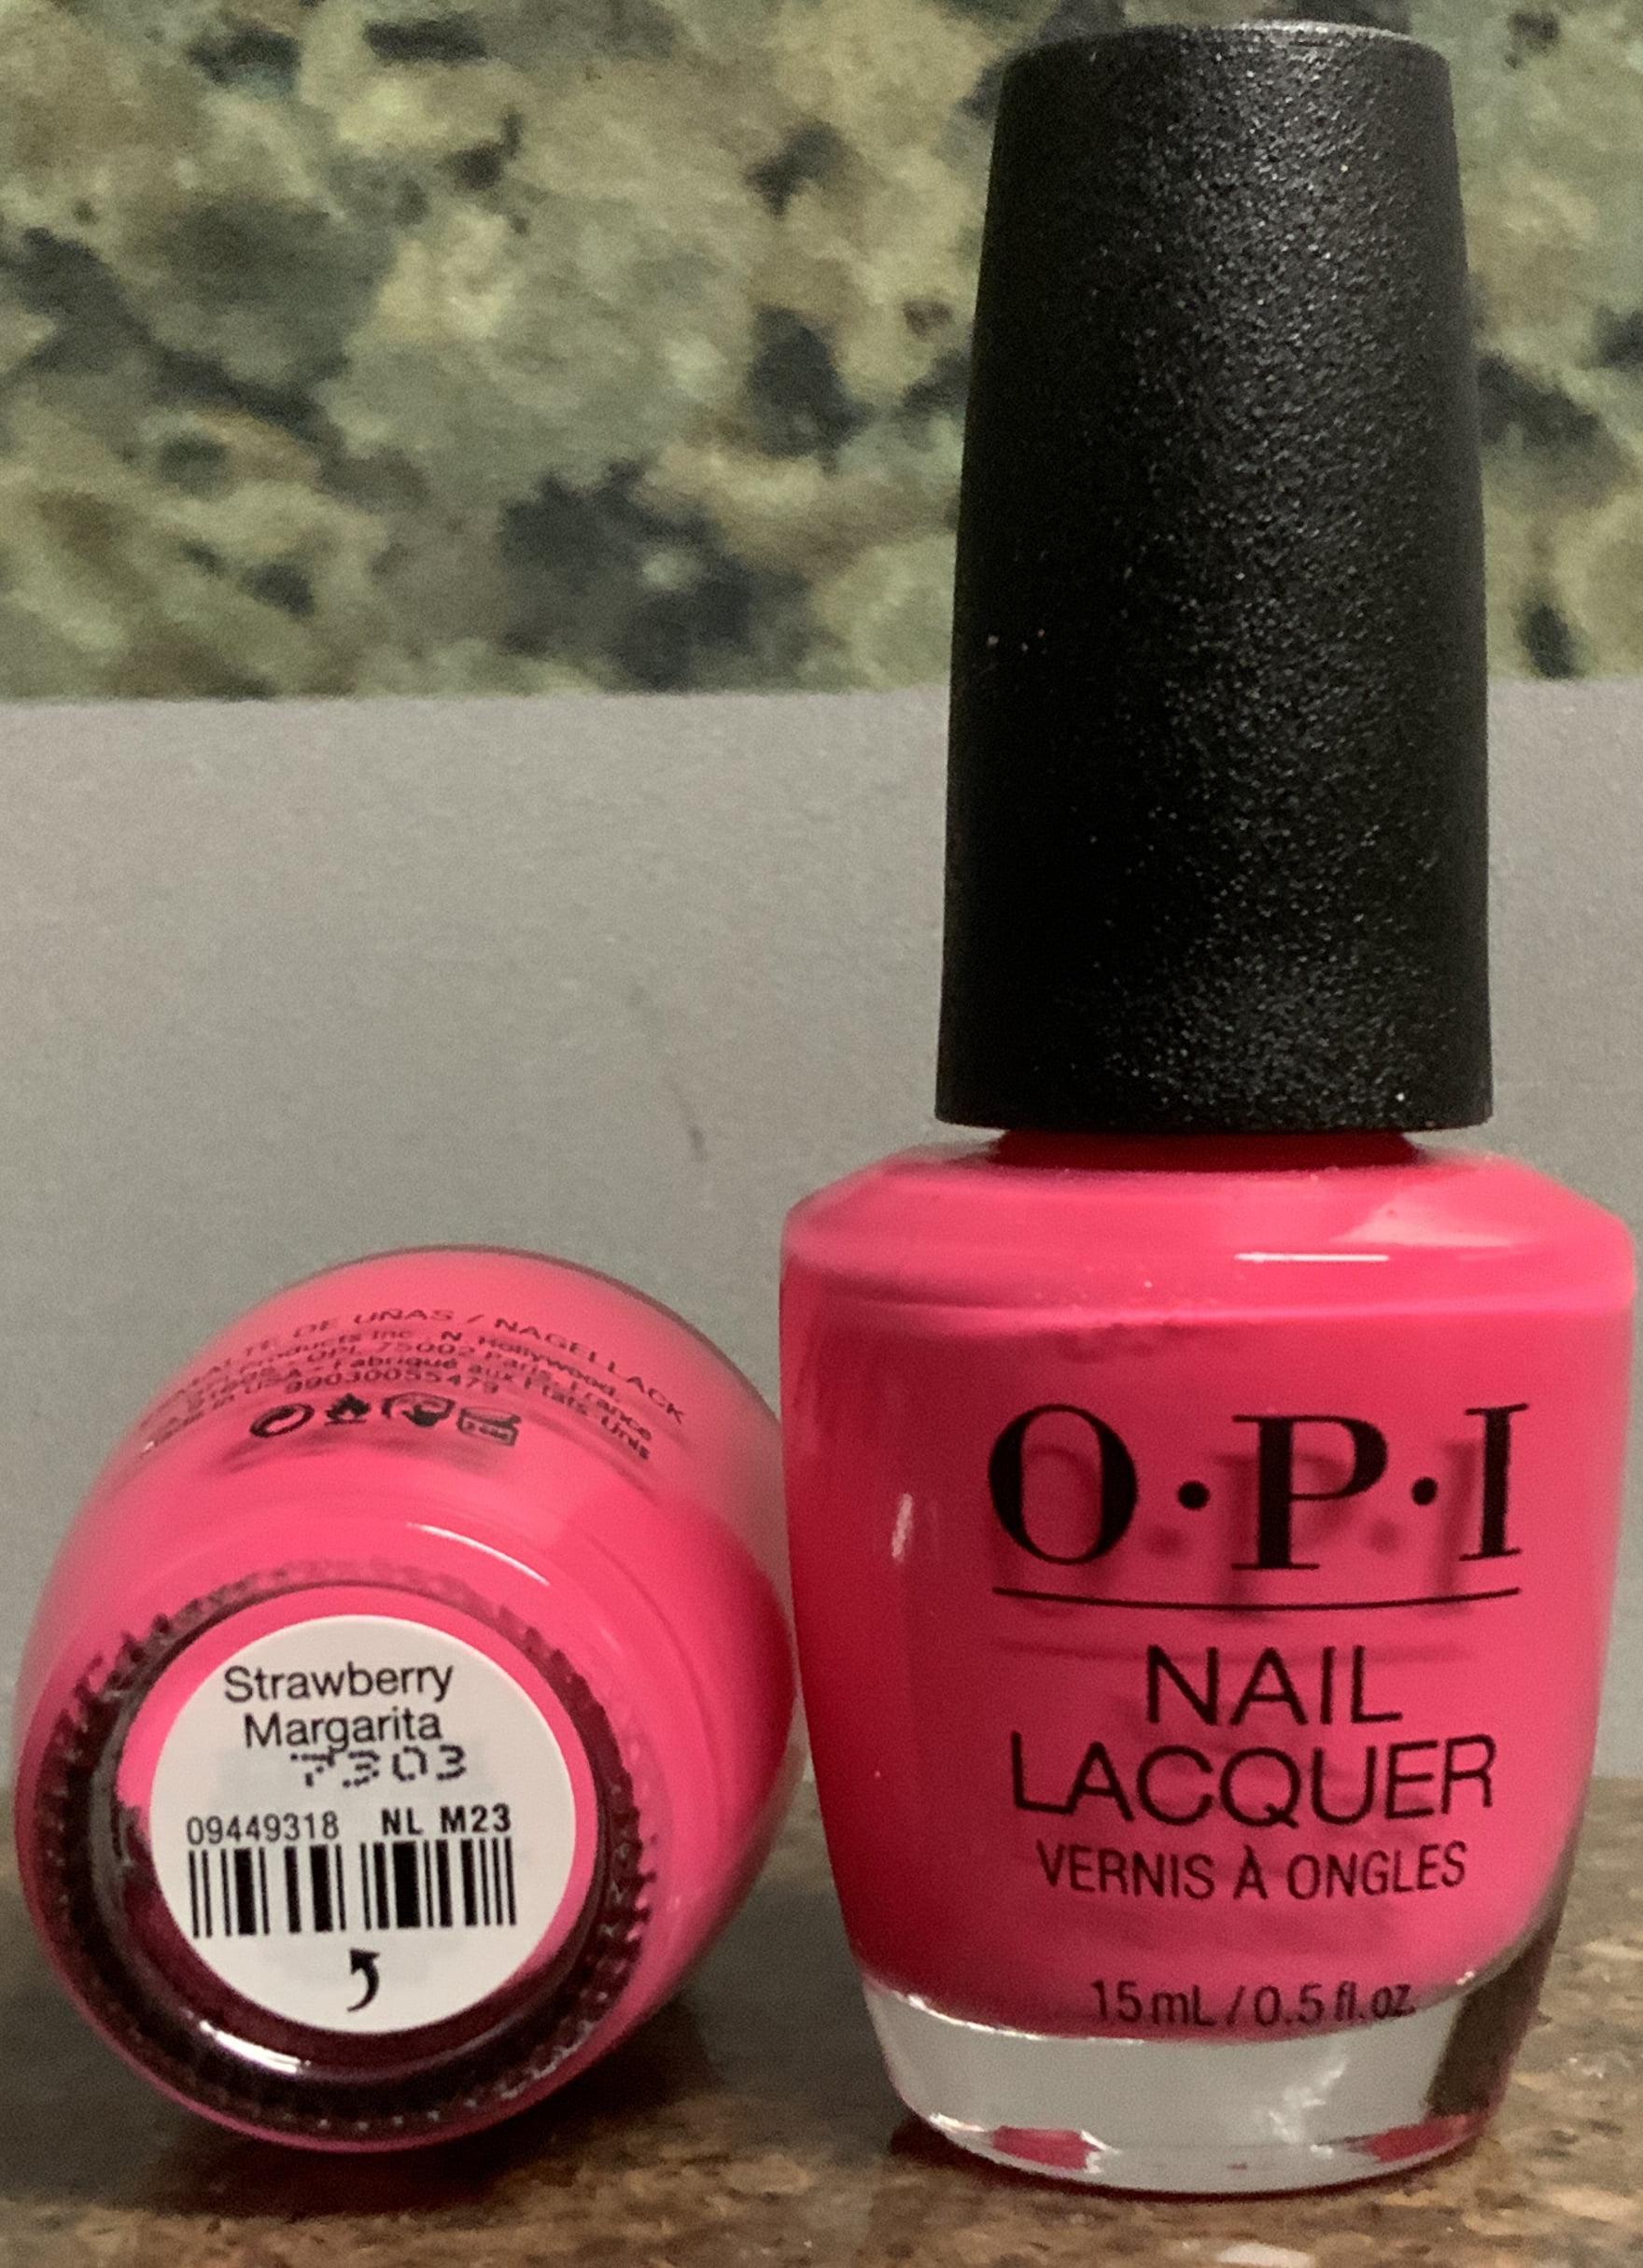 Opi Opi Nail Lacquer Strawberry Margarita 0 5 Fl Oz 2 Bottles Walmart Com Walmart Com